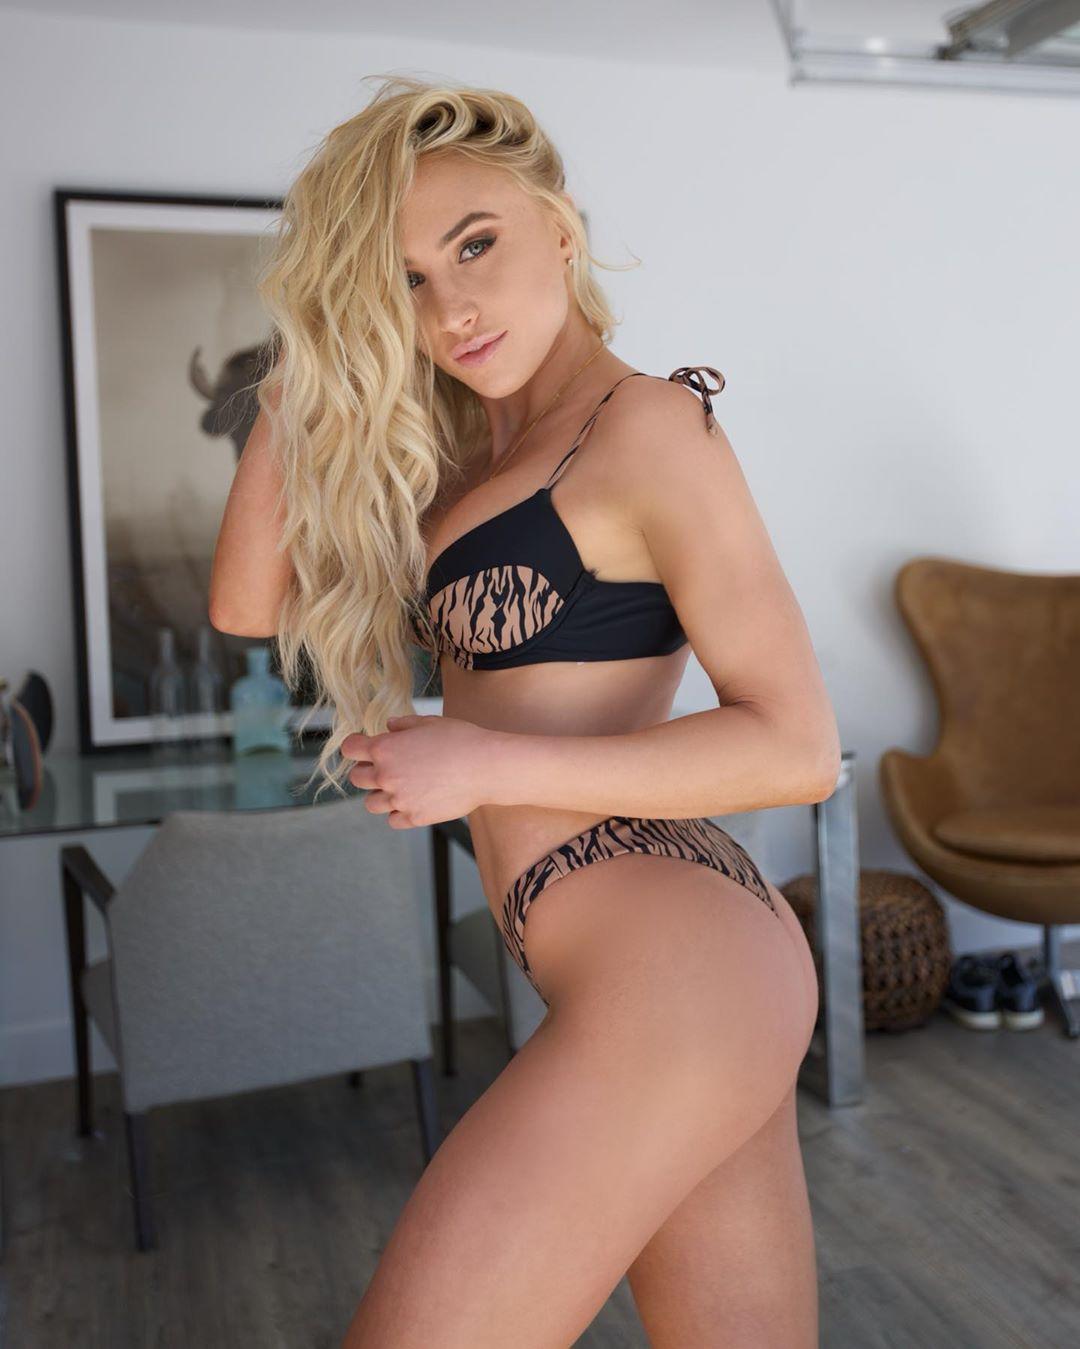 Lauren Dascalo Nude Onlyfans Leaked! 0032